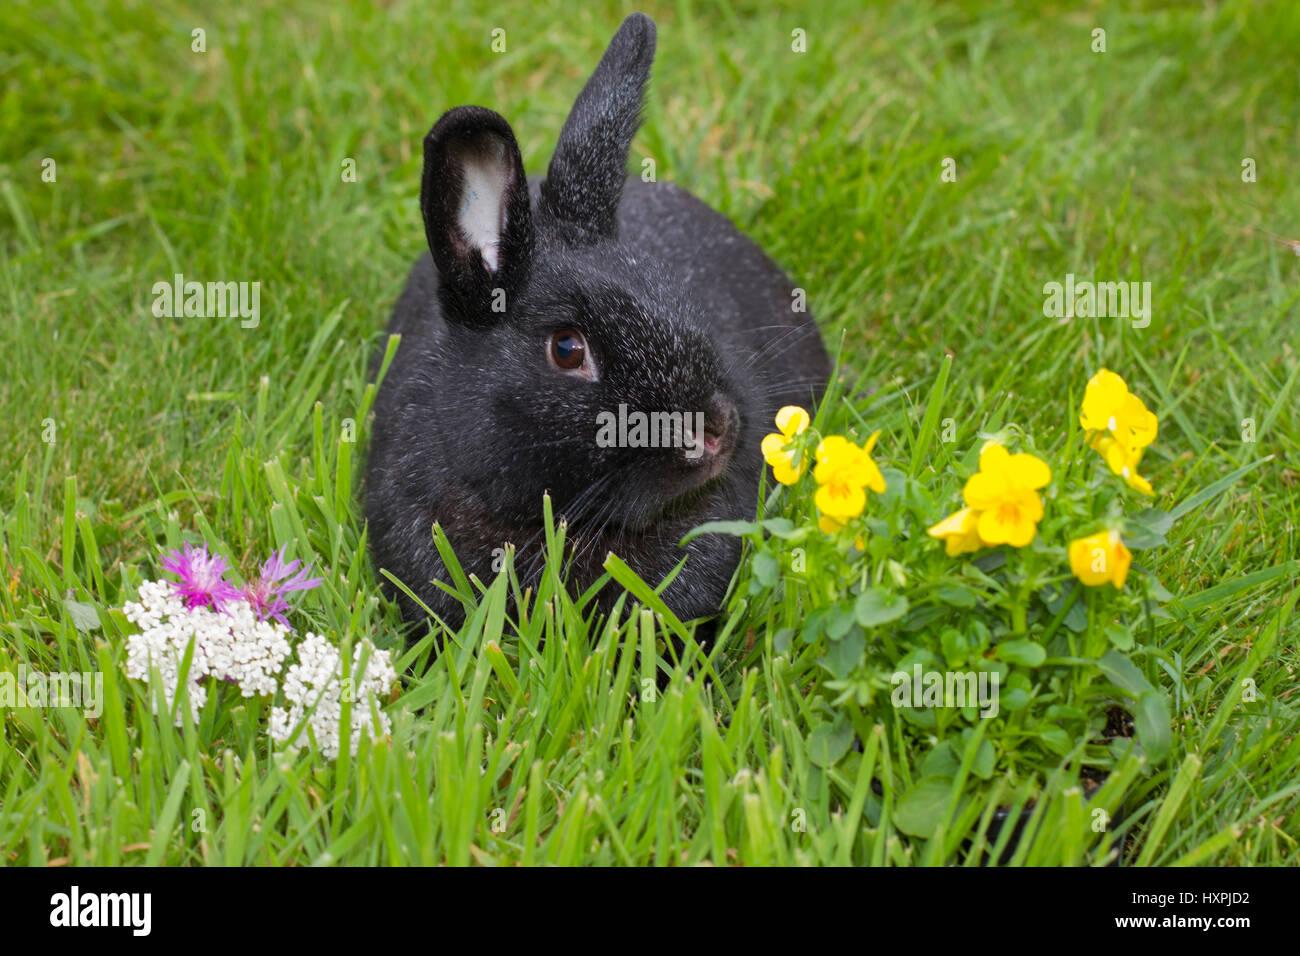 Race rabbits with Blumendeko, Rassekaninchen mit Blumendeko Stock Photo